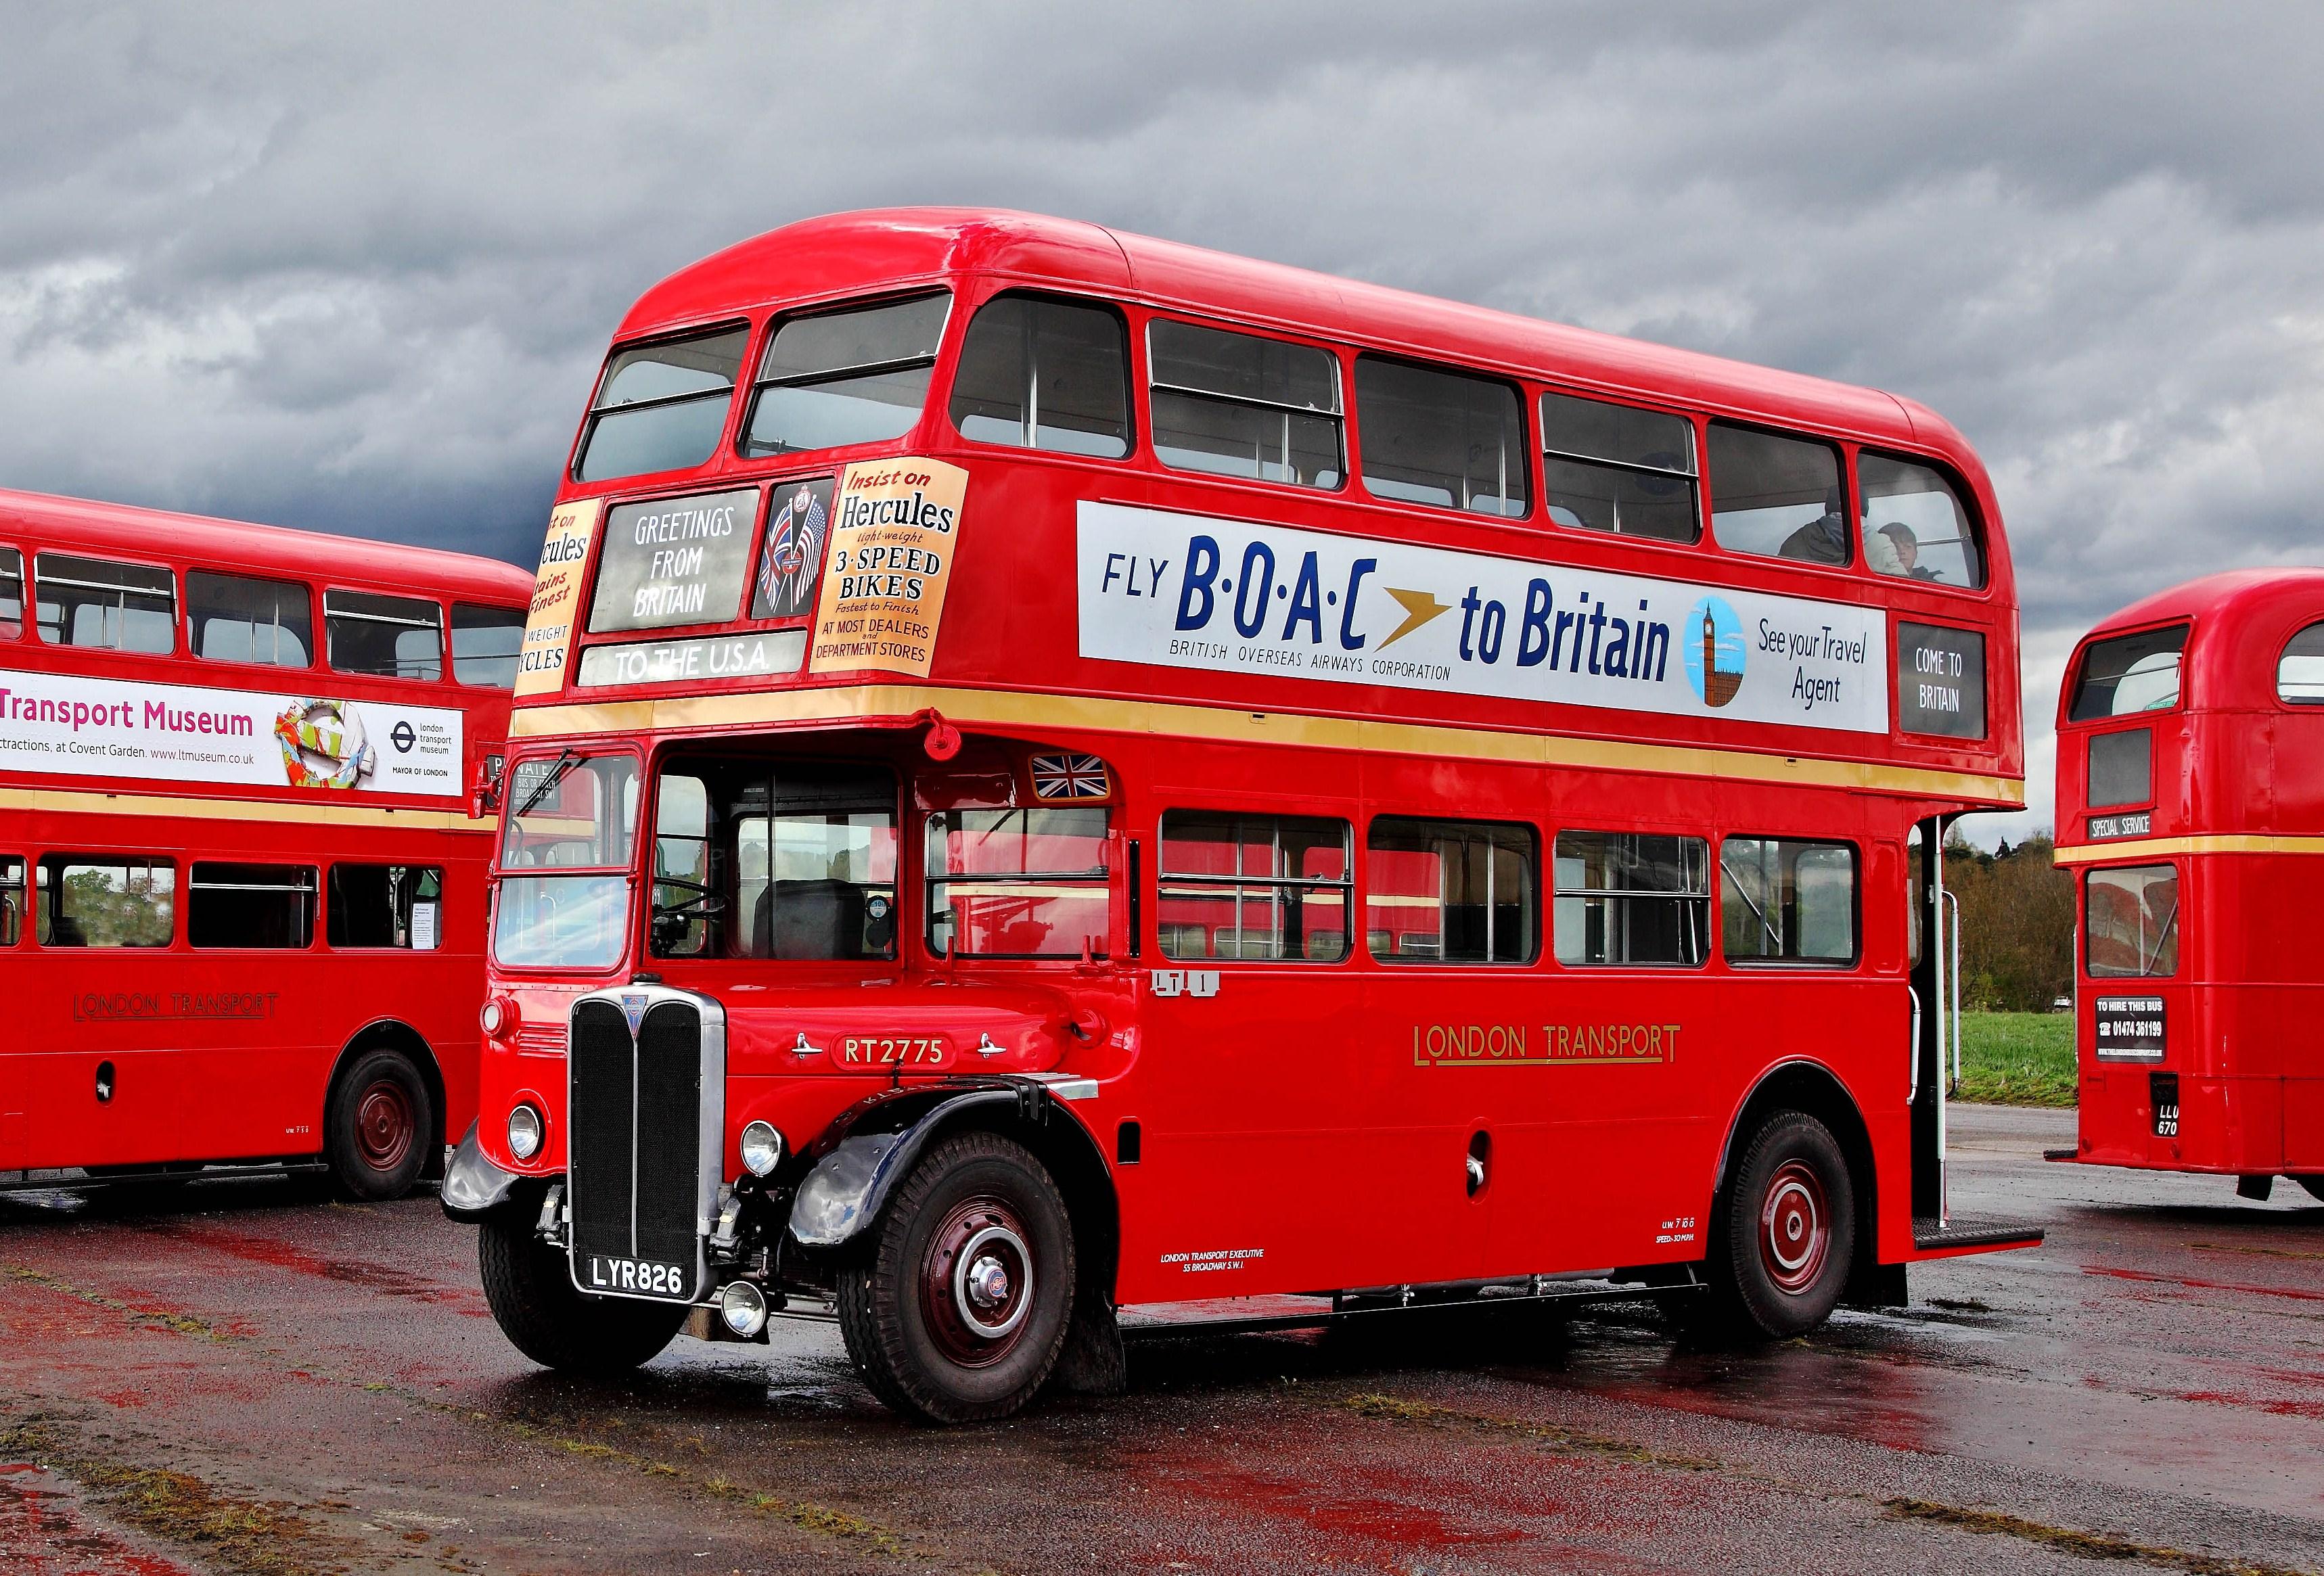 London Bus Vintage Handmade Model Metal Car Double Layer Modeljpg 3435x2330